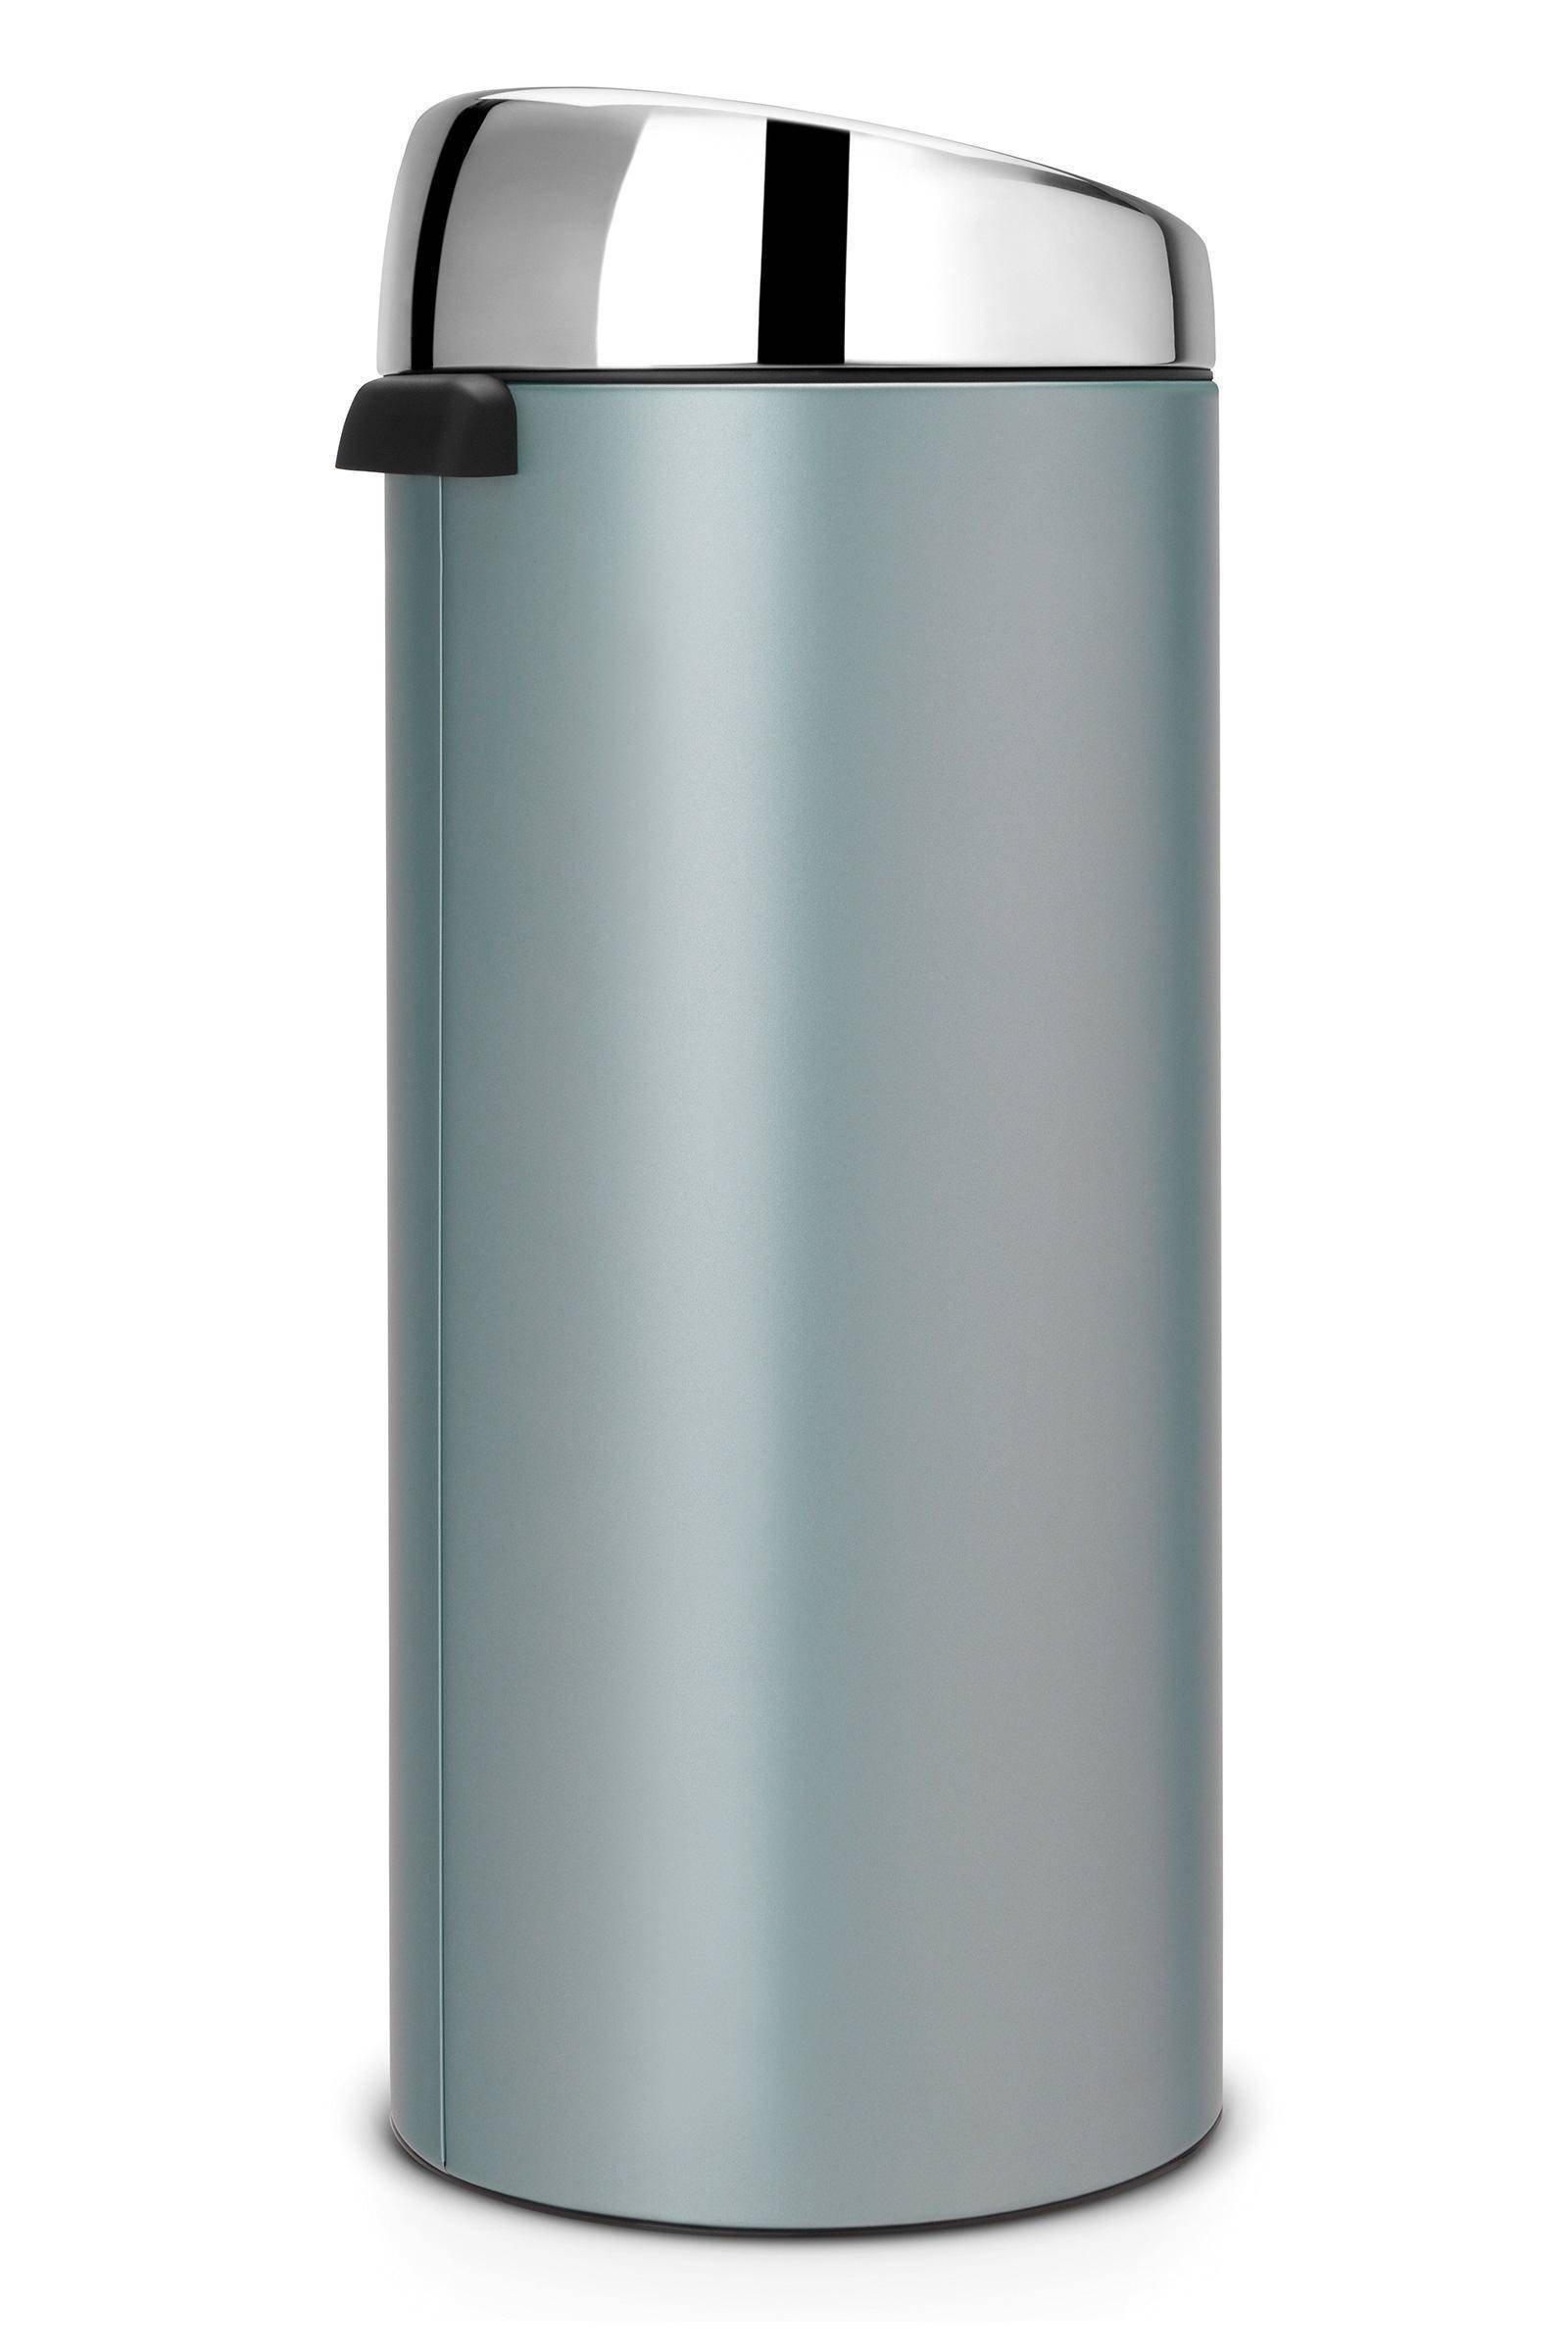 Brabantia Touch Bin Afvalverzamelaar 30 Liter.Touch Bin 30 Liter Prullenbak